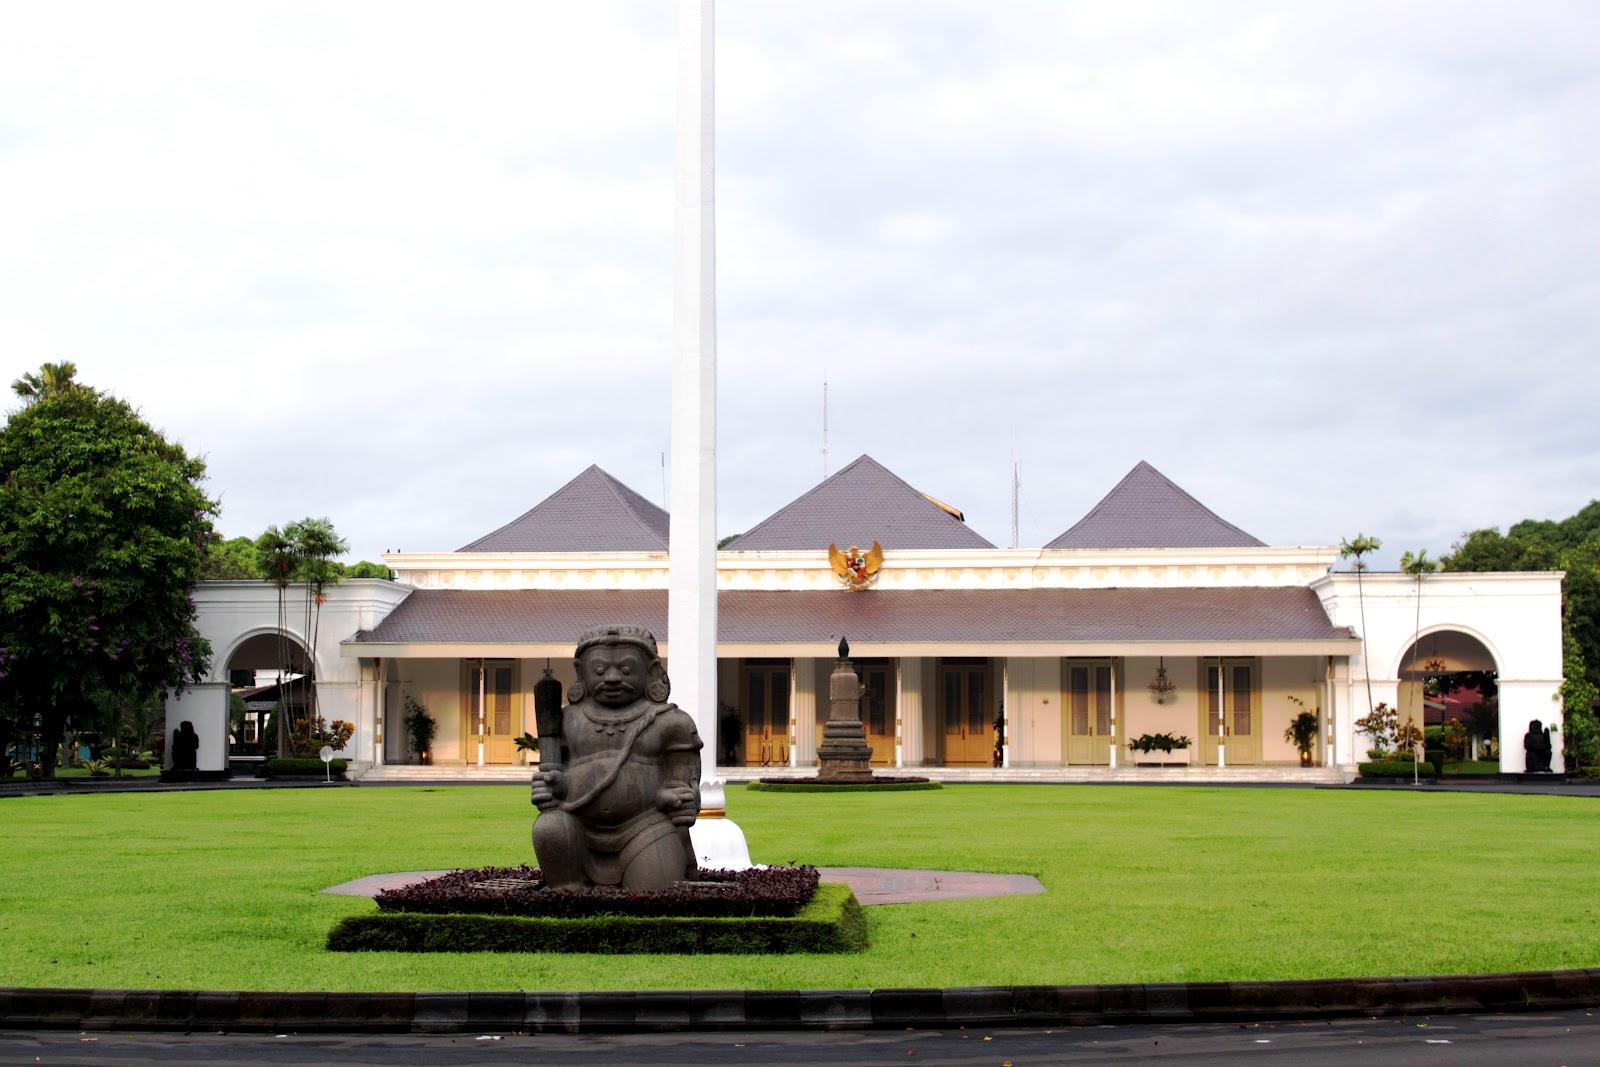 Resmi residen ke 18 di yogyakarta 1823 1825 ia seorang belanda